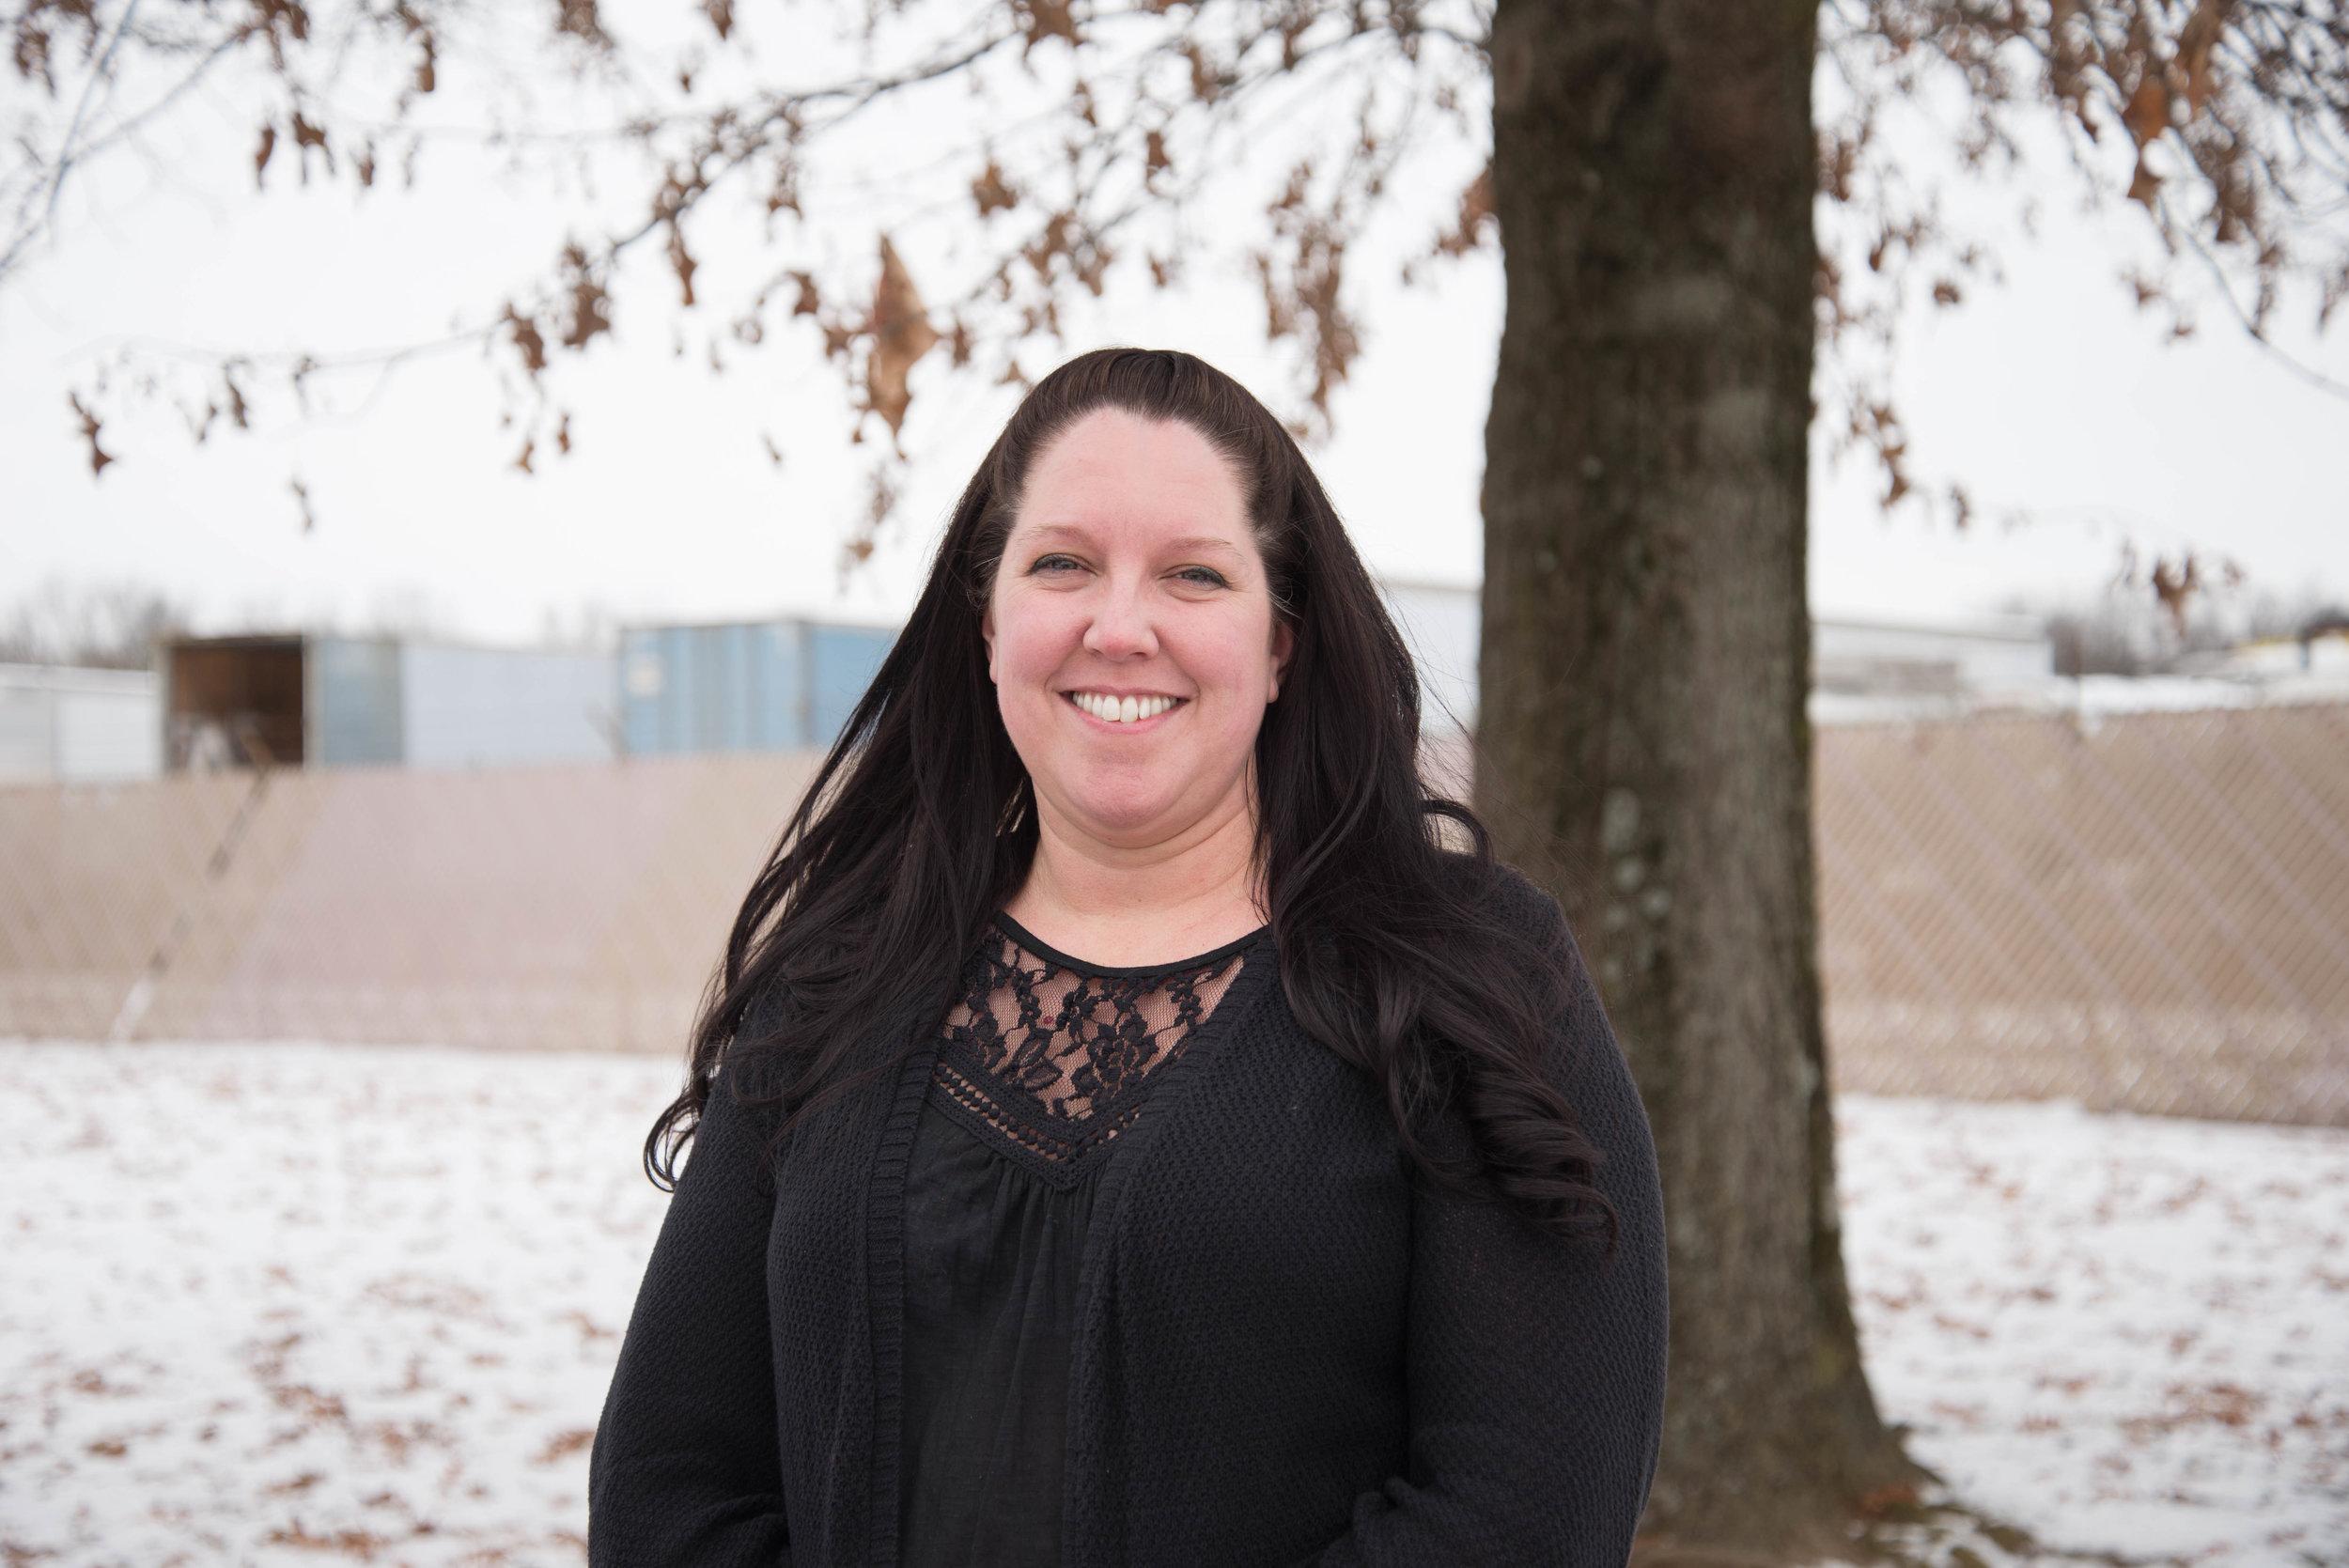 Kathy Brazil, Columbus Office Manager kbrazil@moodysofdayton.com